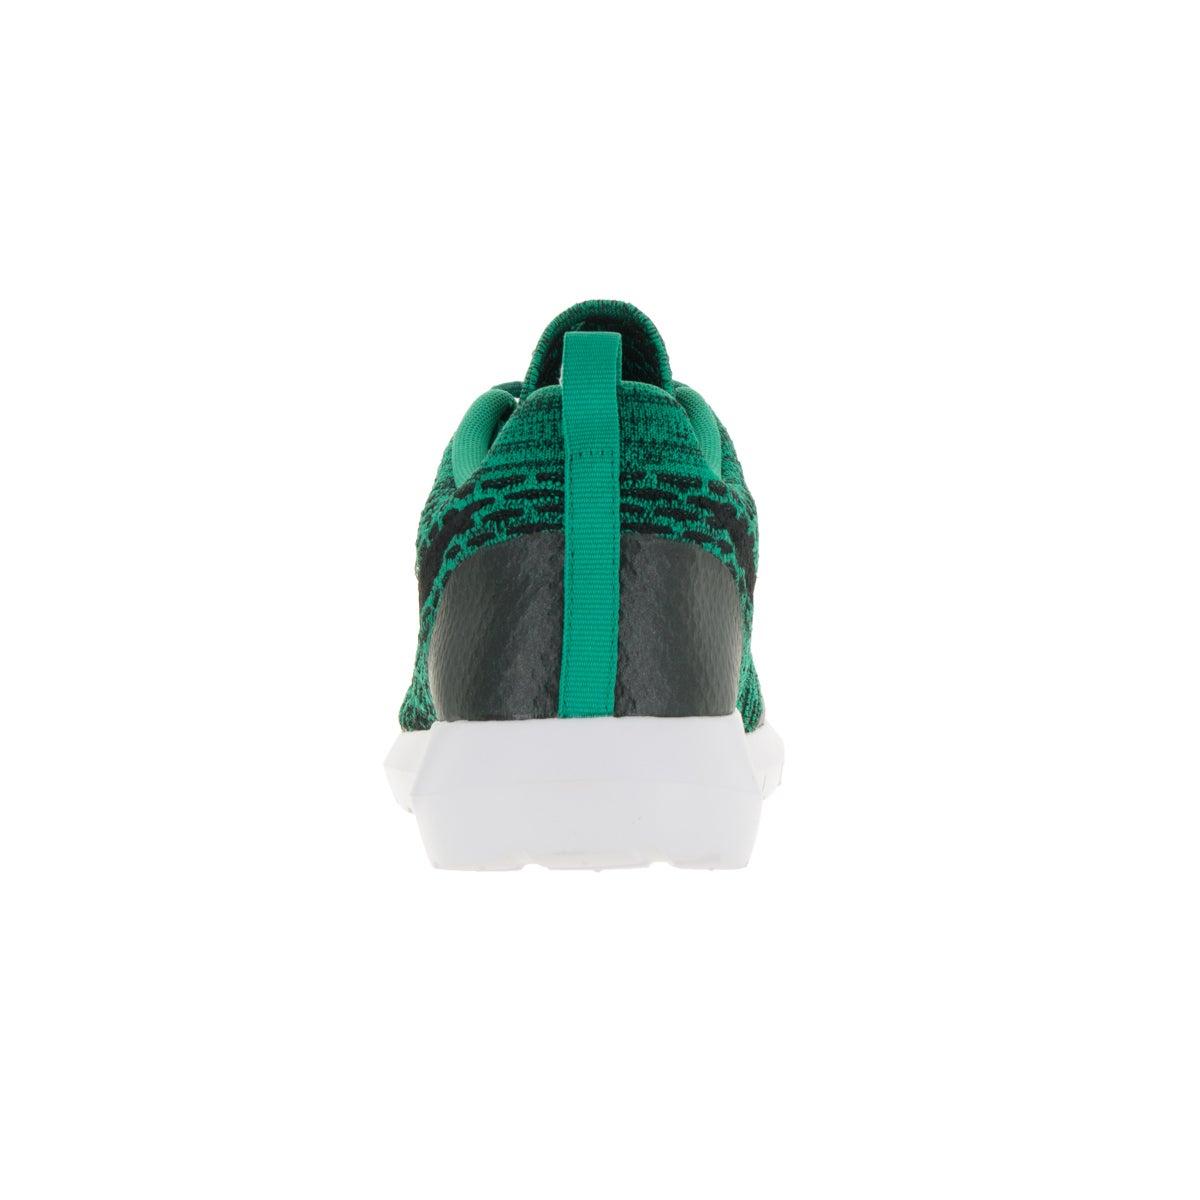 los angeles d9981 86615 Shop Nike Men s Roshe NM Flyknit SE Lucid Green Black White Running Shoe -  Free Shipping Today - Overstock - 13394785